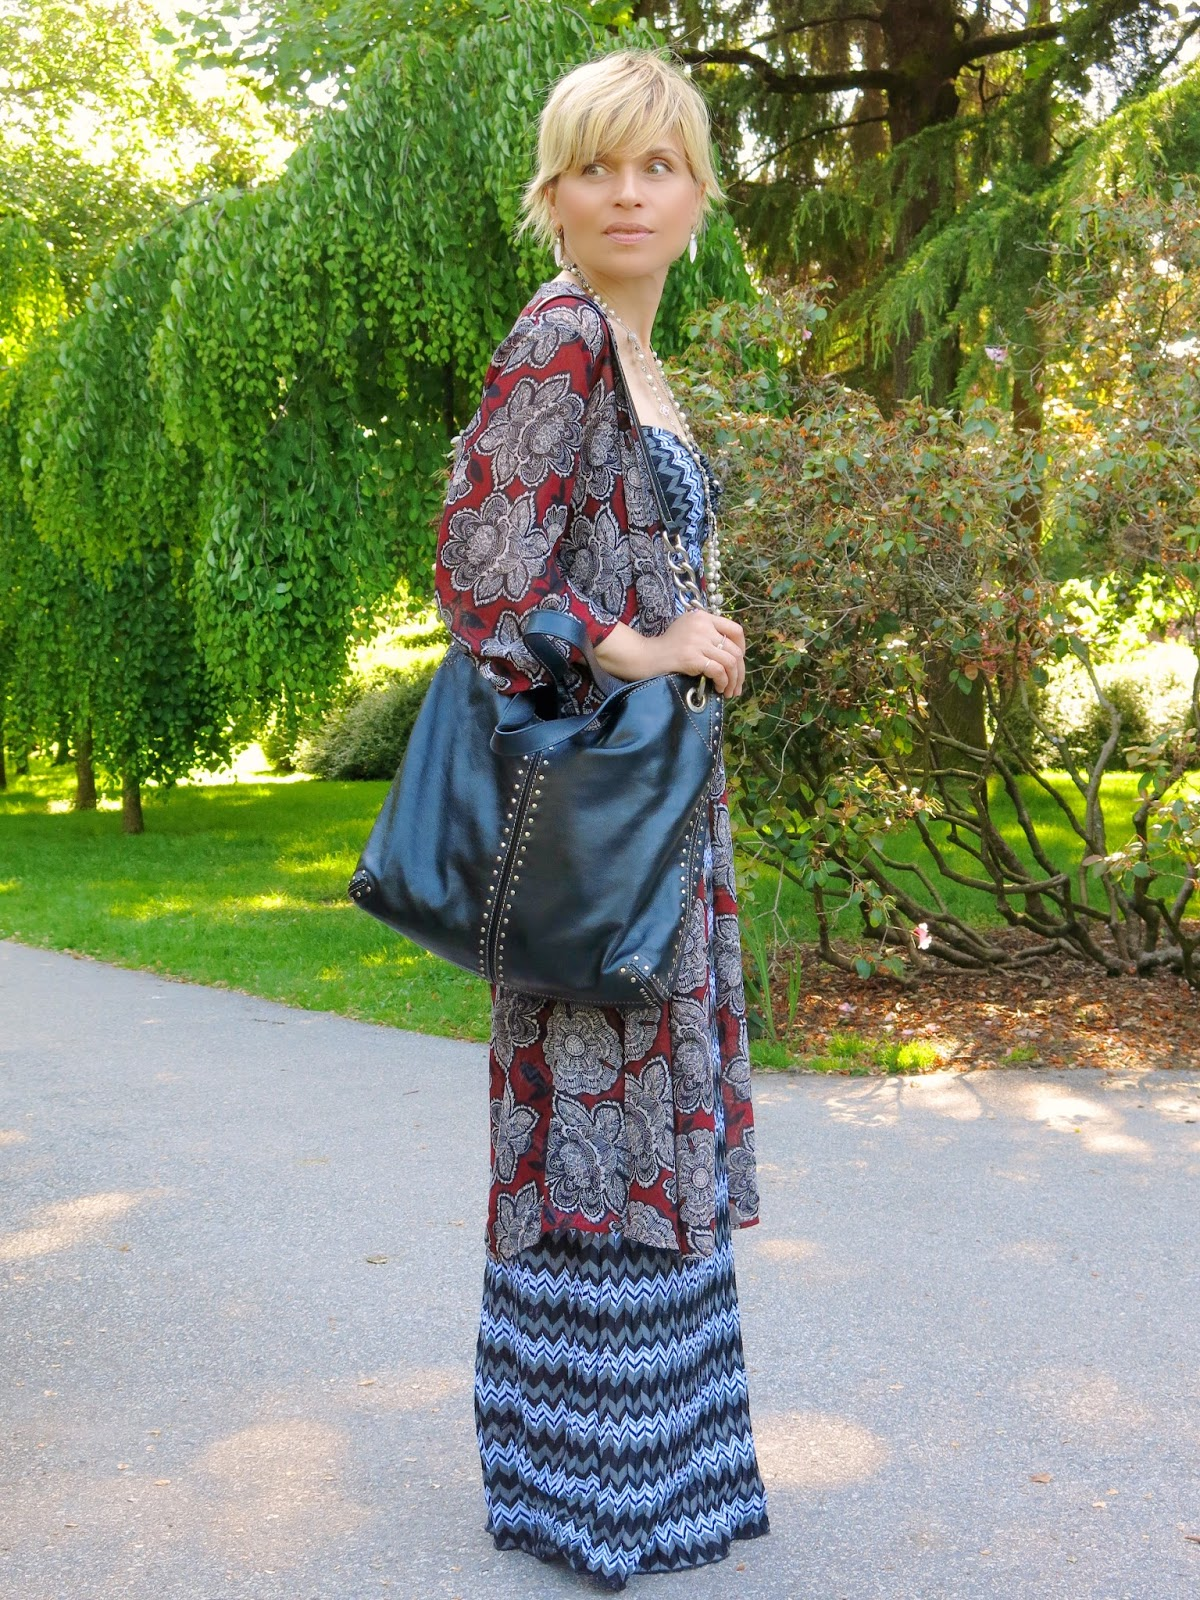 Styling a striped maxi dress with a floral chiffon kimono